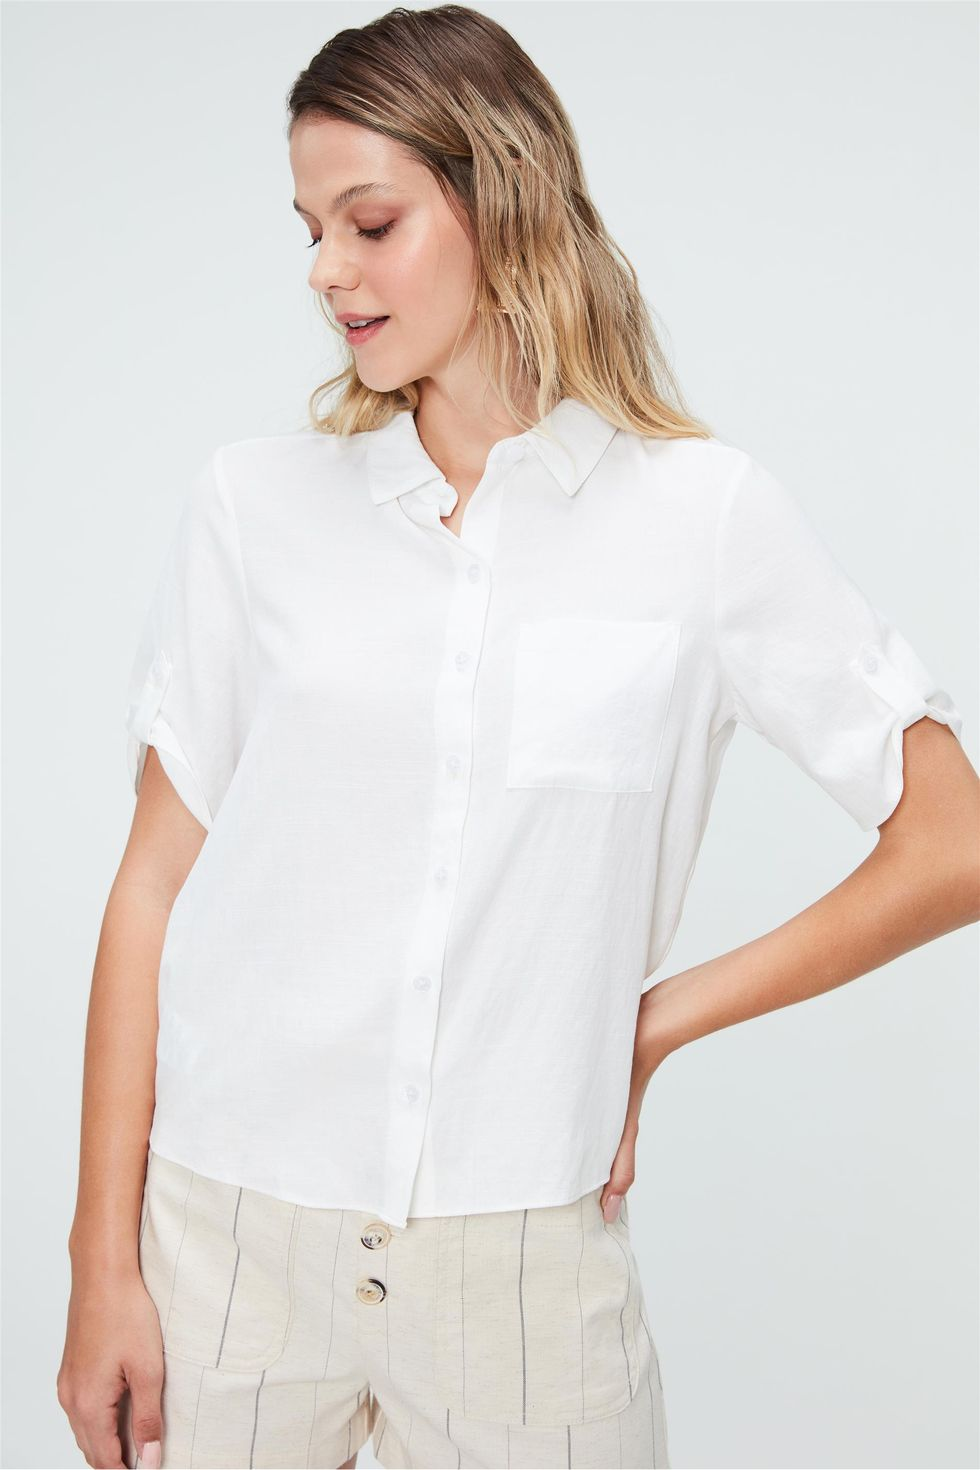 Camisa-Lisa-de-Mangas-Curtas-Feminina-Frente--